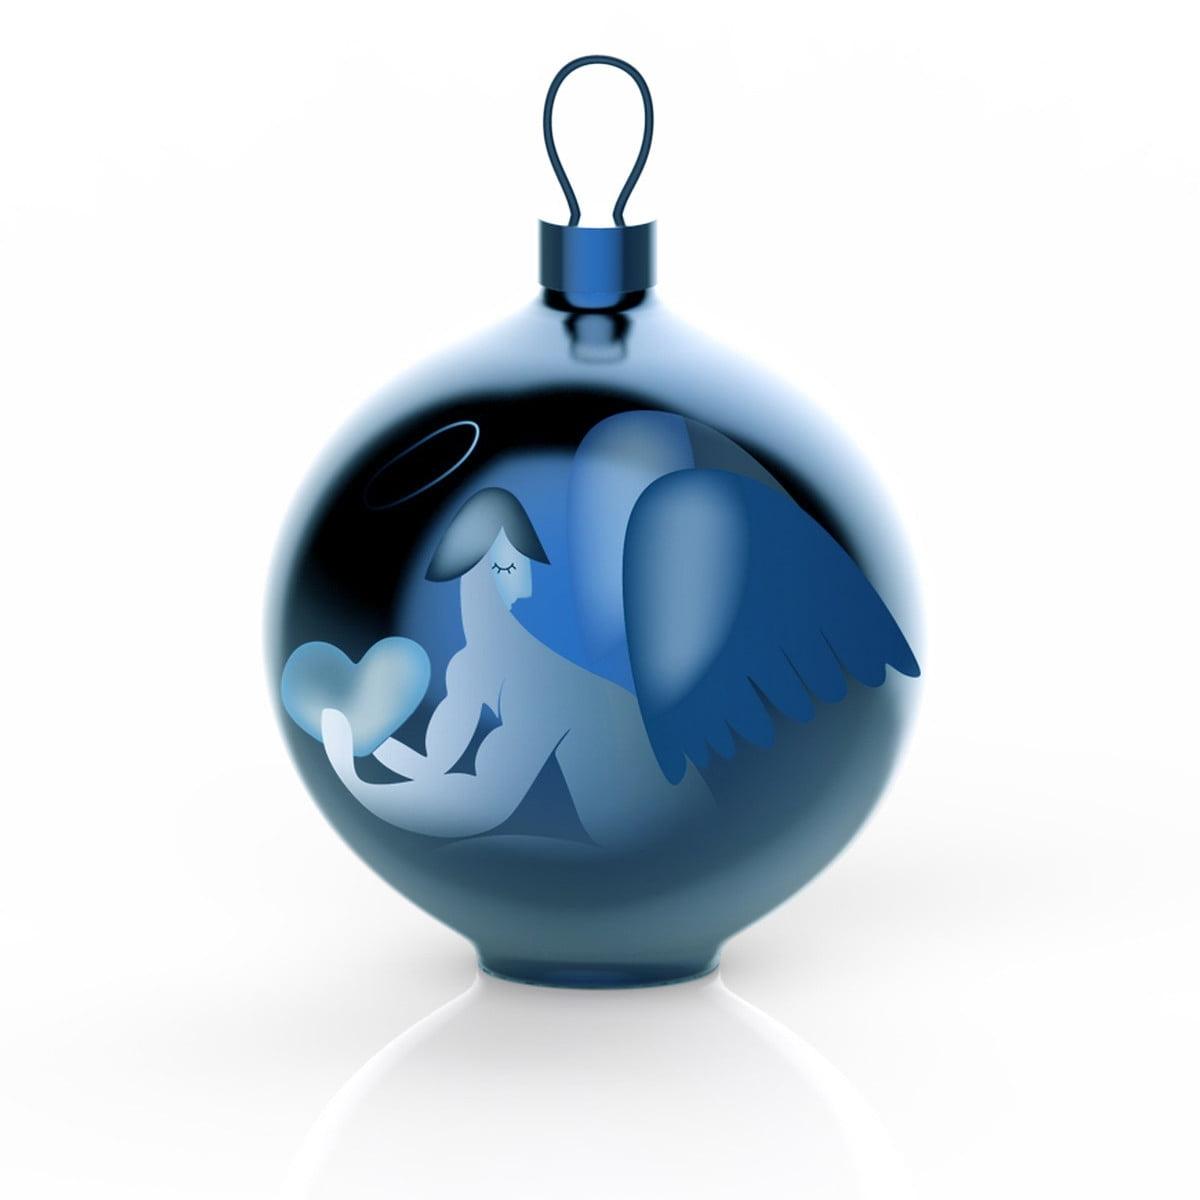 Christbaumkugeln Besondere.Alessi Blue Christmas Christbaumkugeln Engel